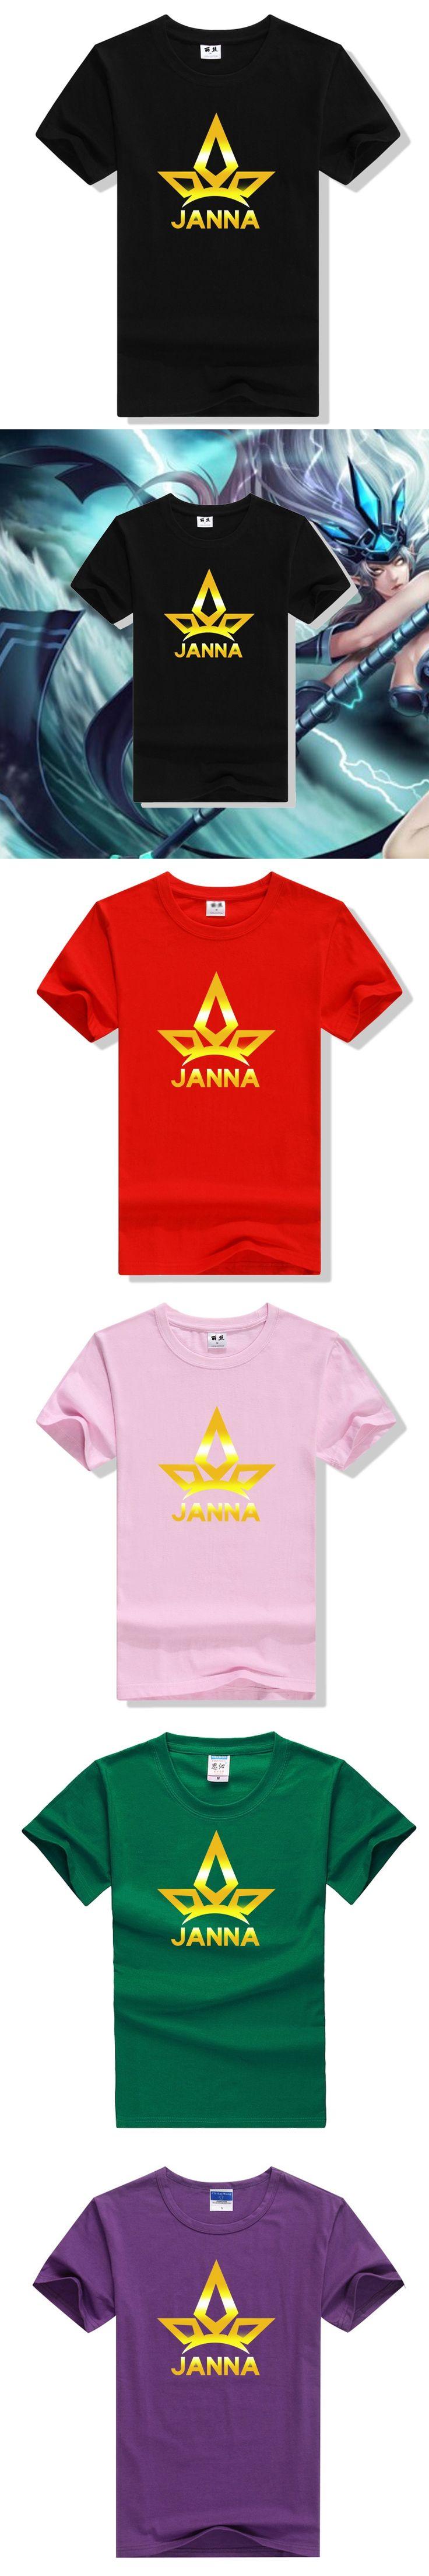 LOL heros concept new designed gold shining layer t shirt LOL Janna Ghana color t shirts ac544